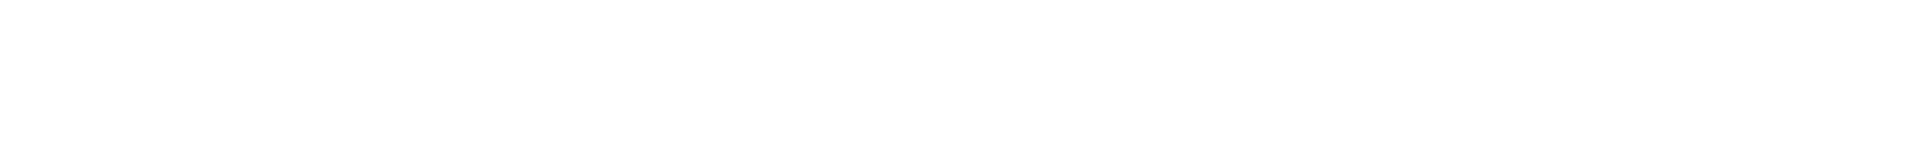 Kanobu Dark Theme— кастомный css - Изображение 4